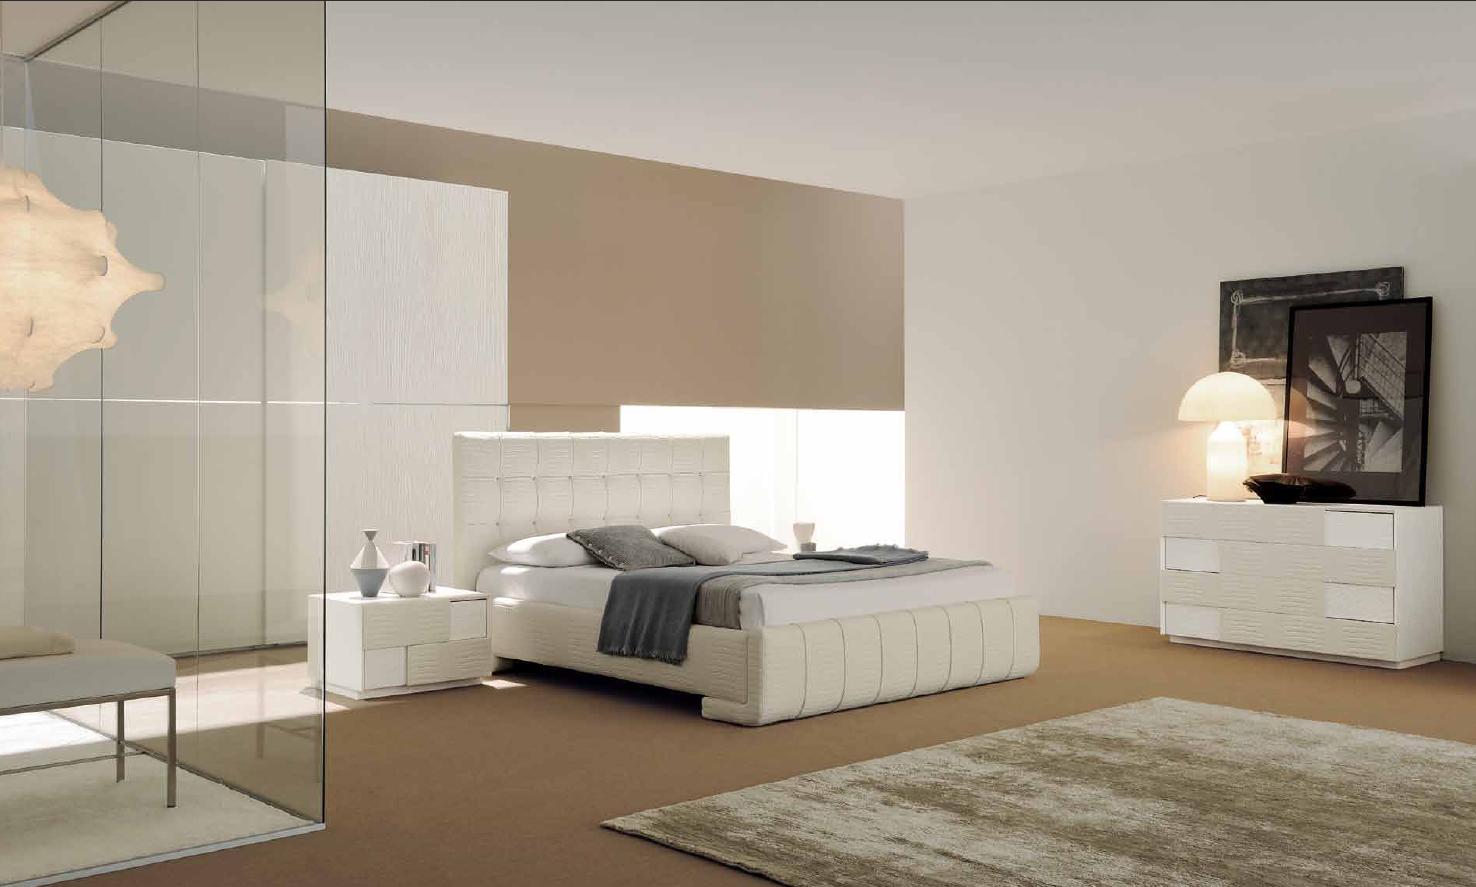 تصاميم غرفة نوم ايكيا مودرن | المرسال